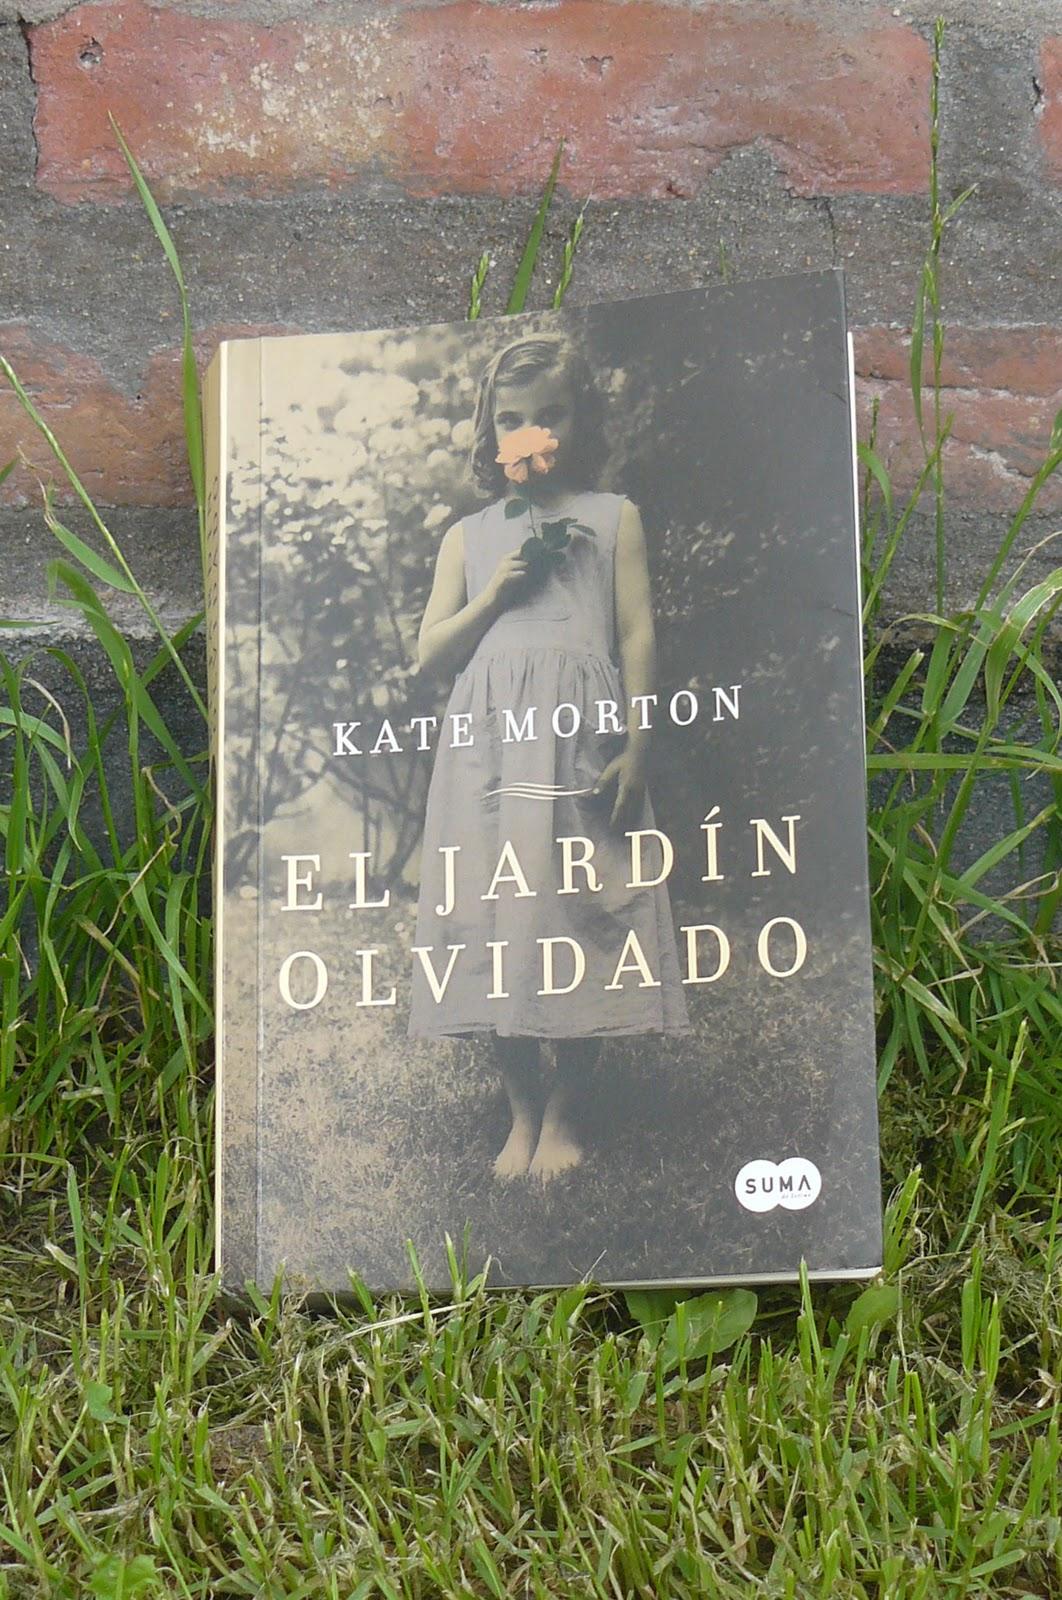 Critica libro kate morton el jardin olvidado www for Libro jardin olvidado